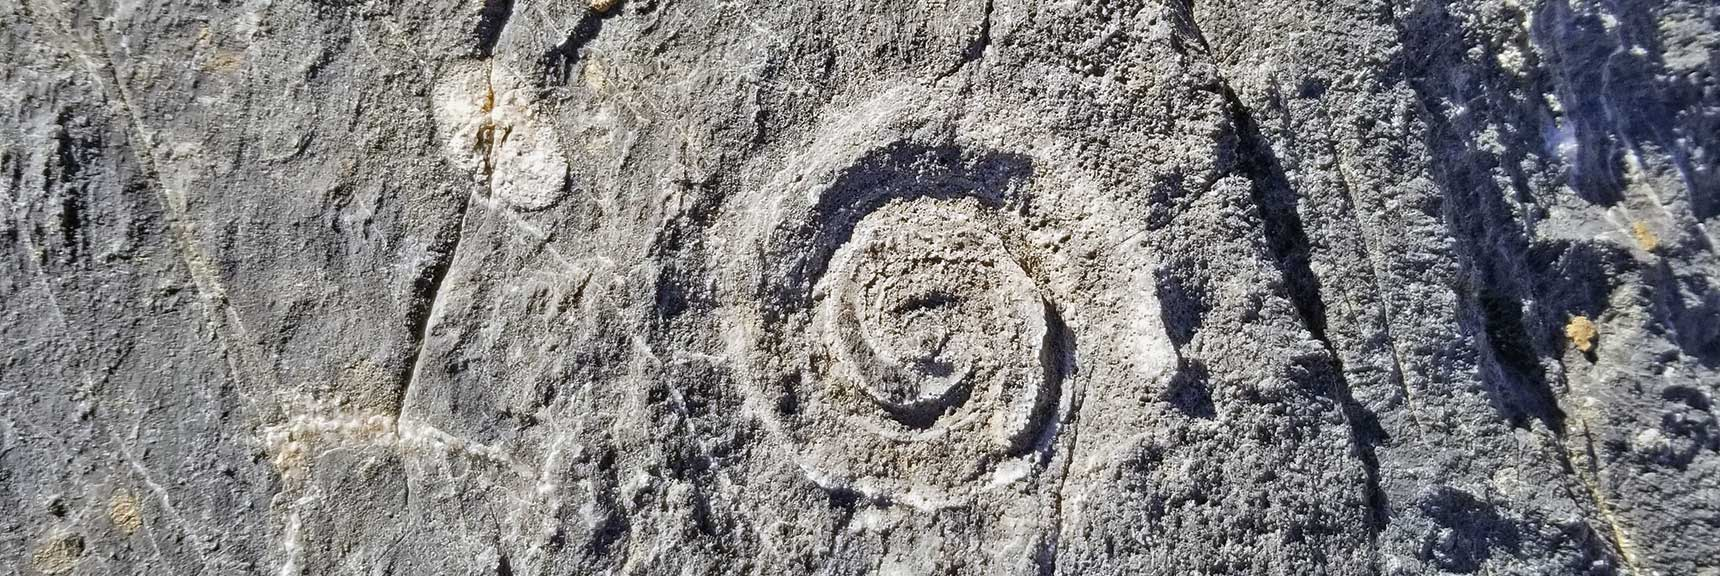 Fossil Rock on North Fossil Ridge in the Desert National Wildlife Refuge, Nevada